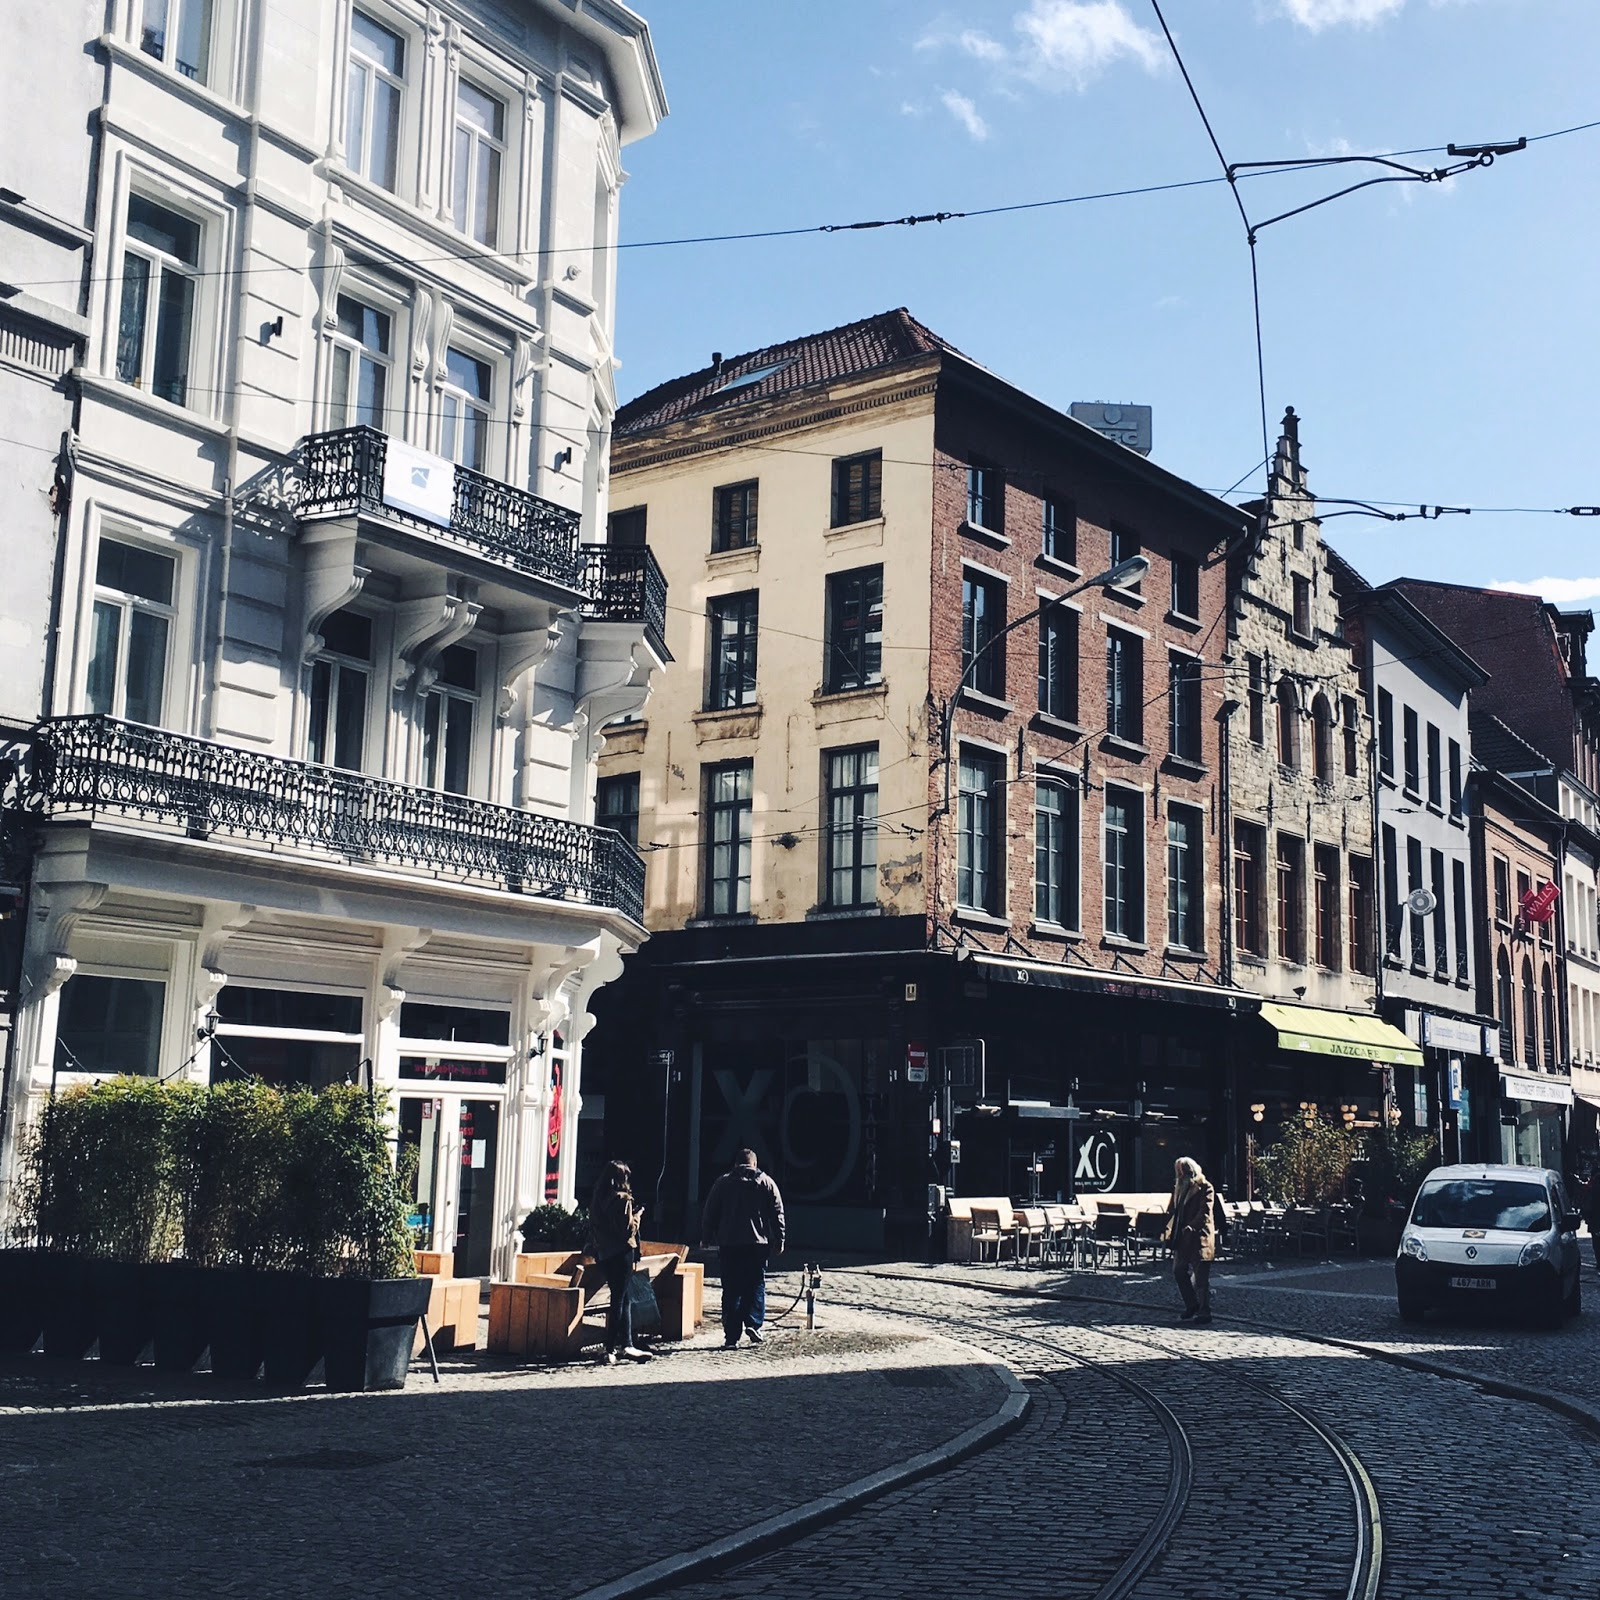 Antwerp travel diary